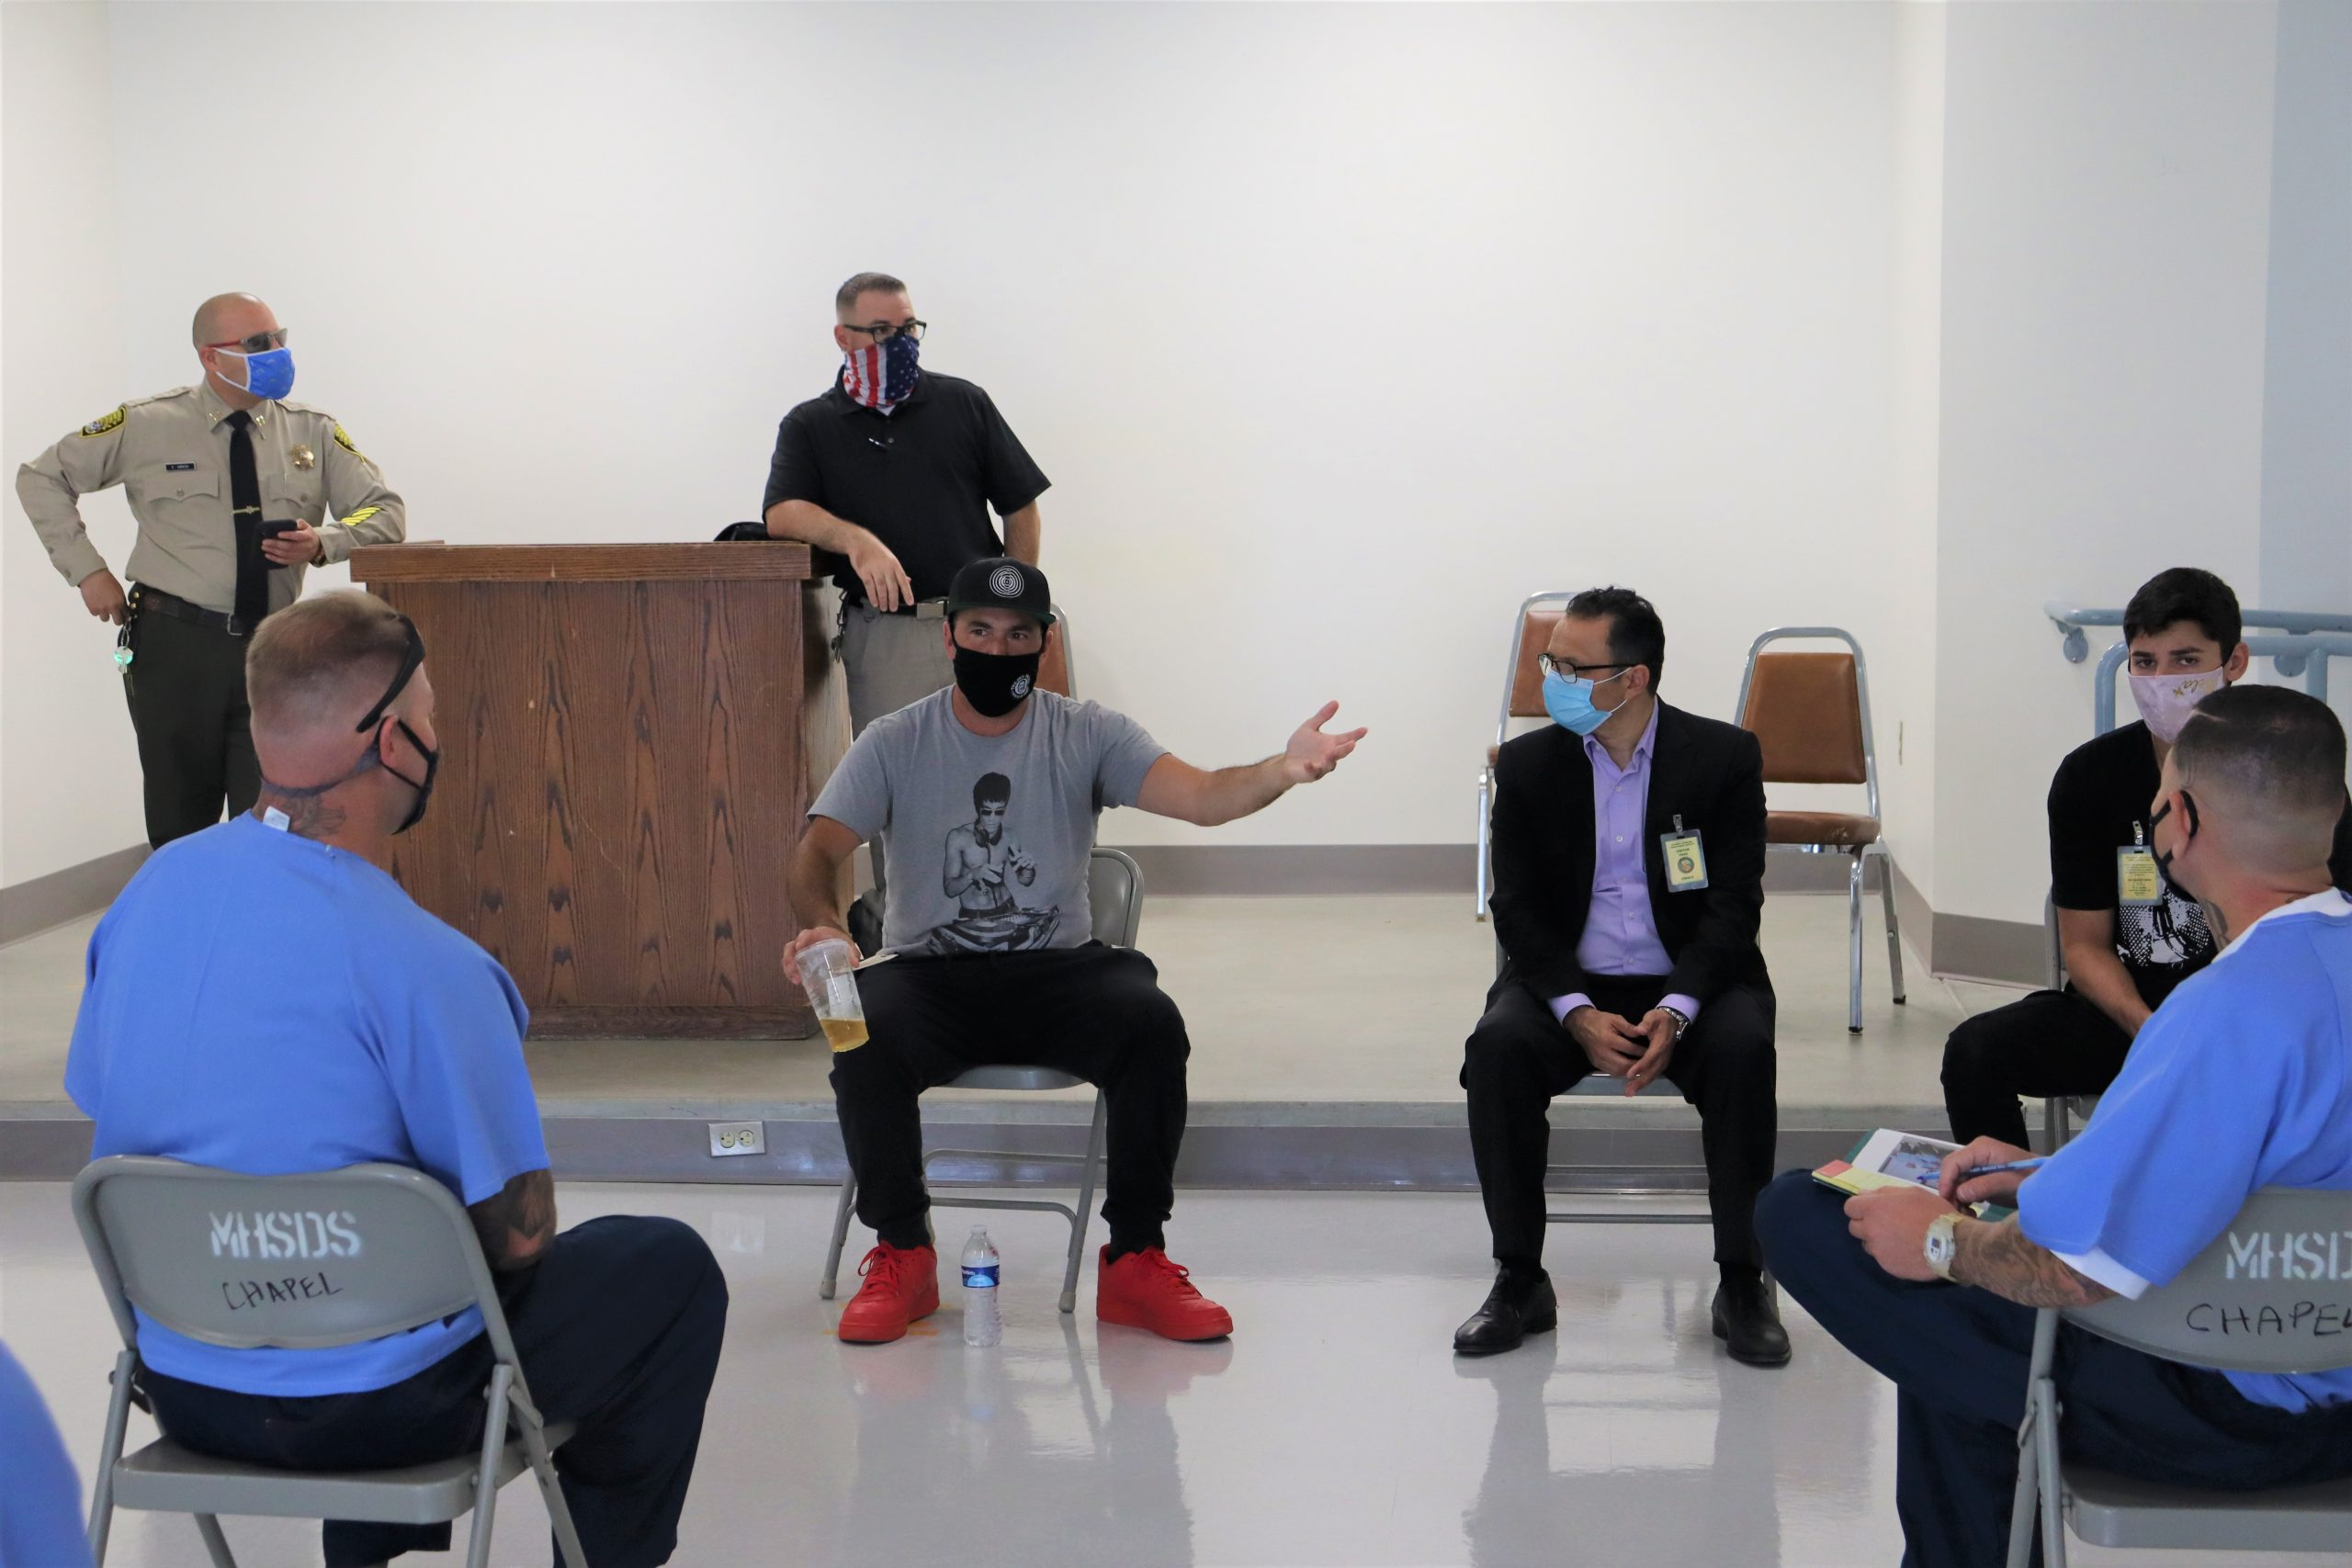 RJD Correctional Facility Inmates listen to men speak.